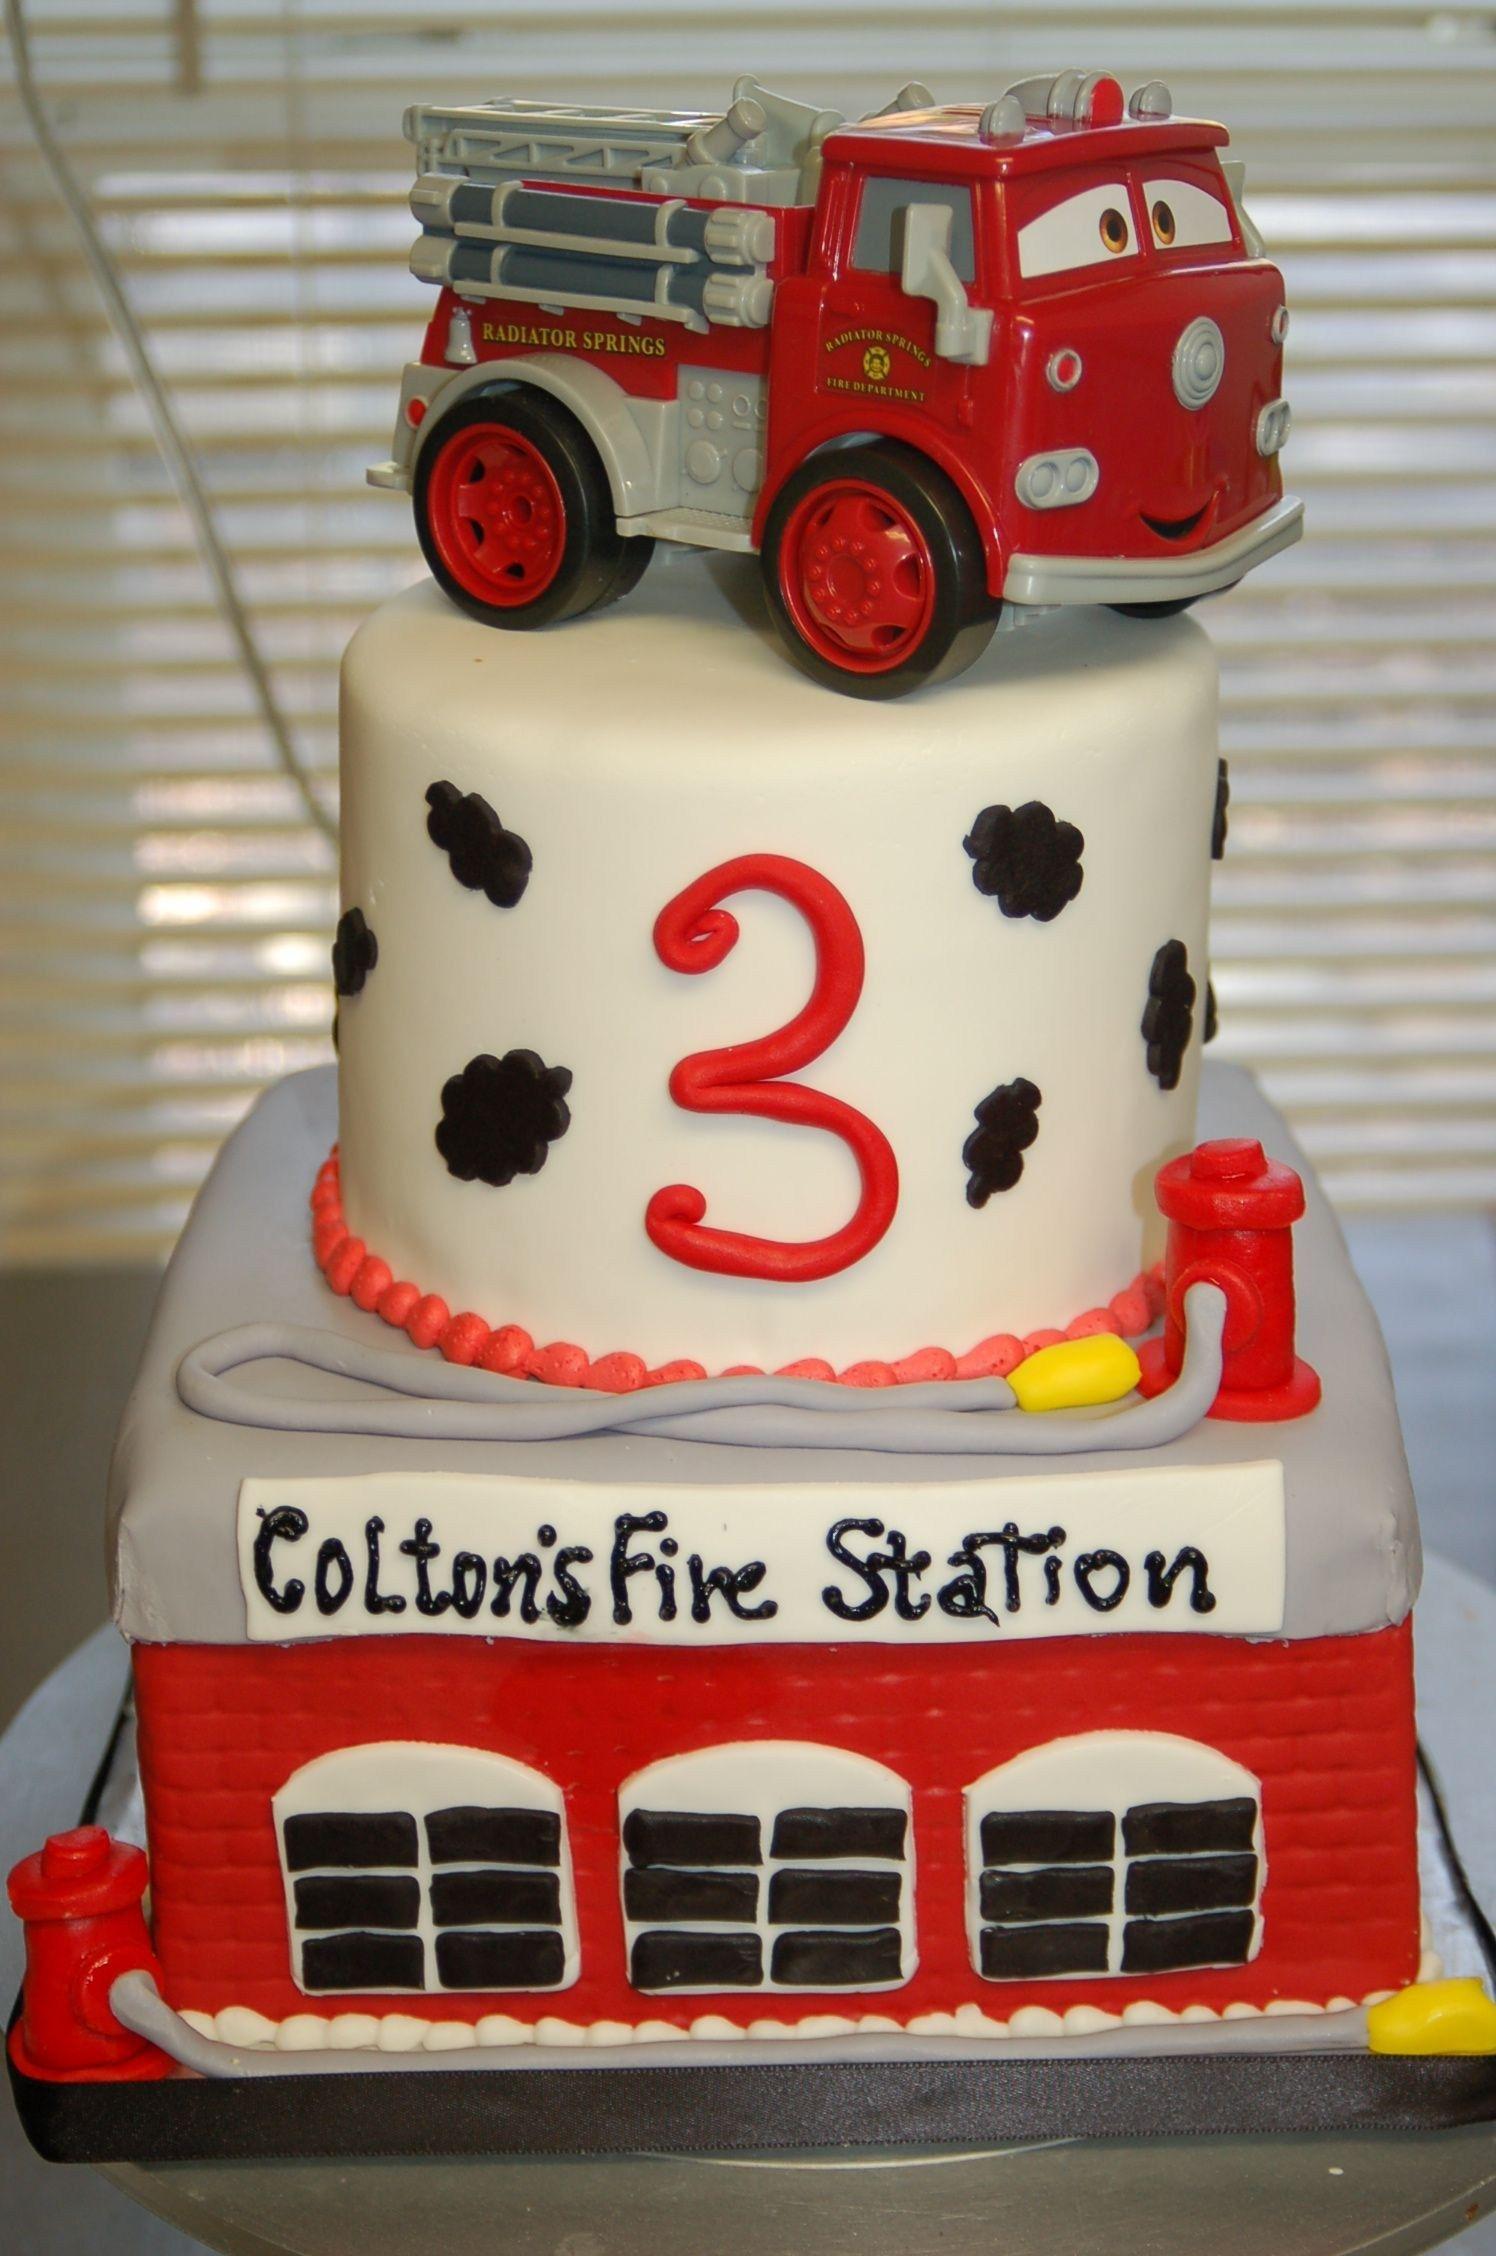 Remarkable 21 Wonderful Image Of Fireman Birthday Cake Truck Birthday Funny Birthday Cards Online Inifofree Goldxyz